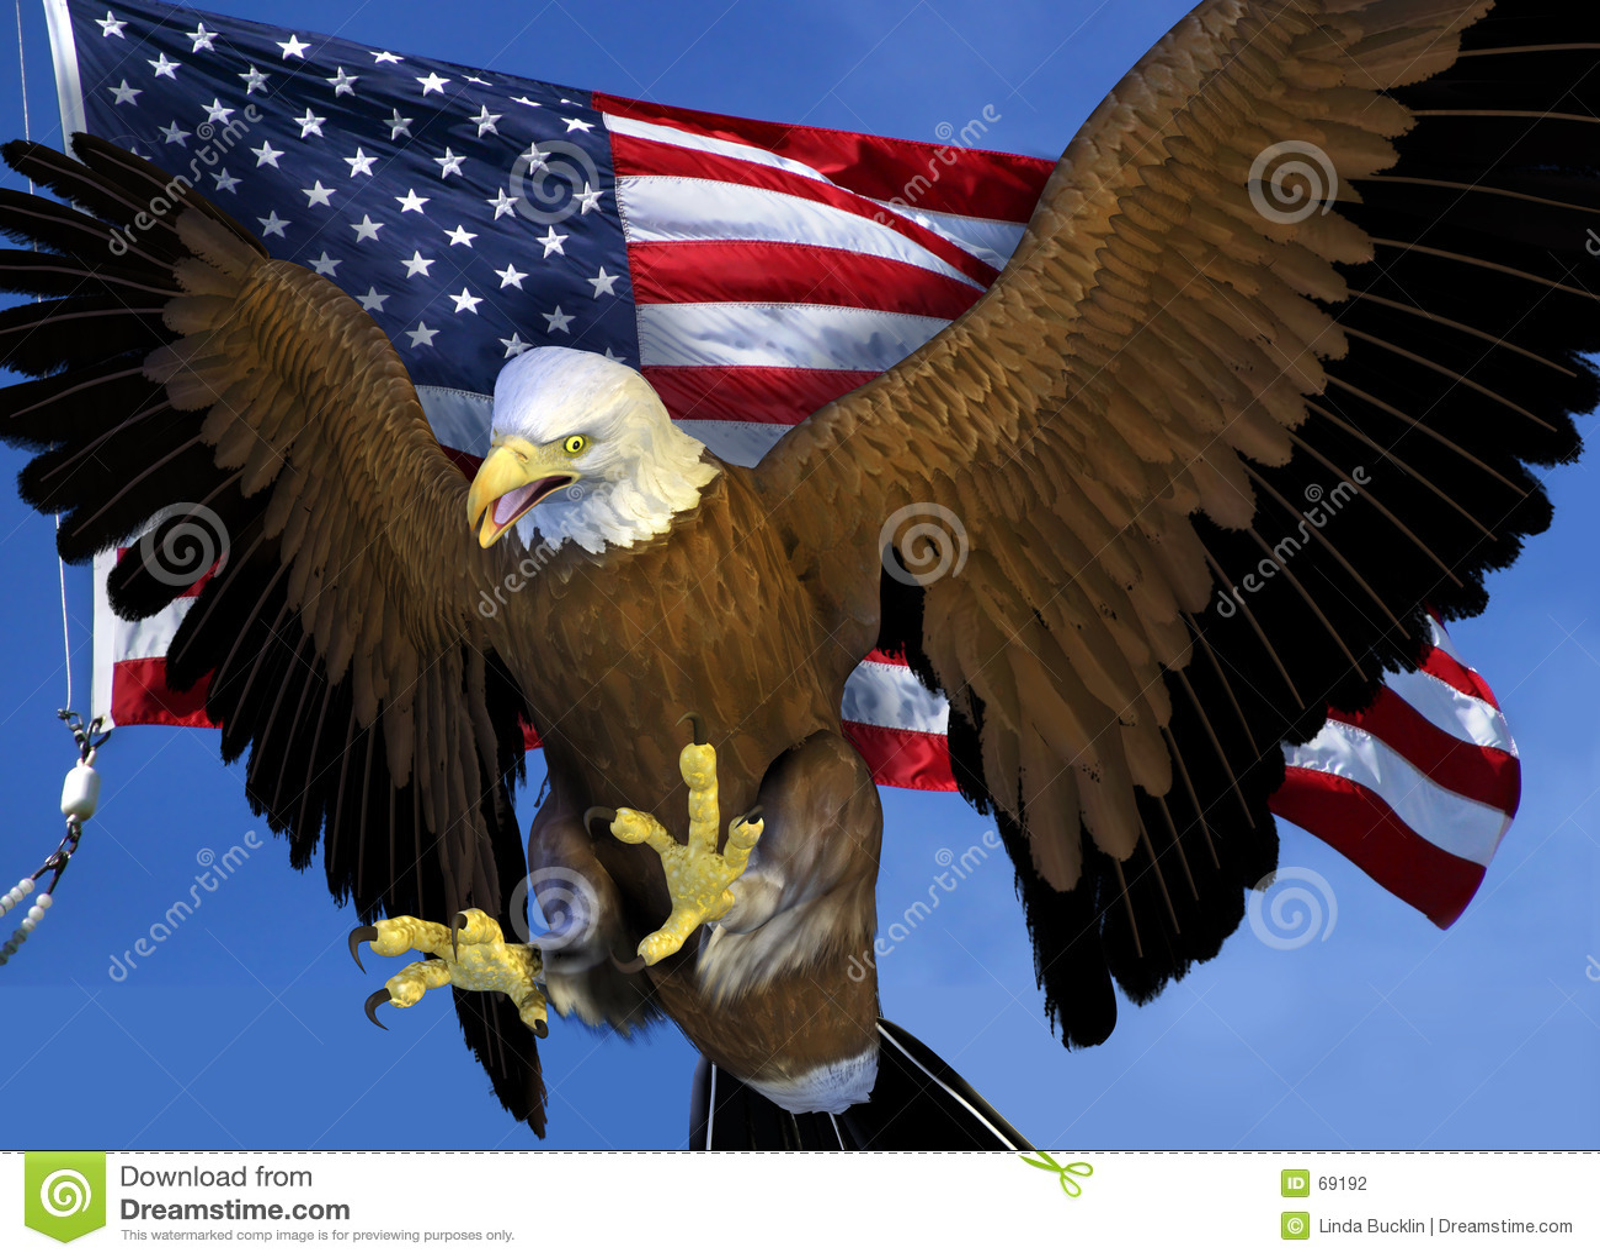 Bald Eagle with US Flag